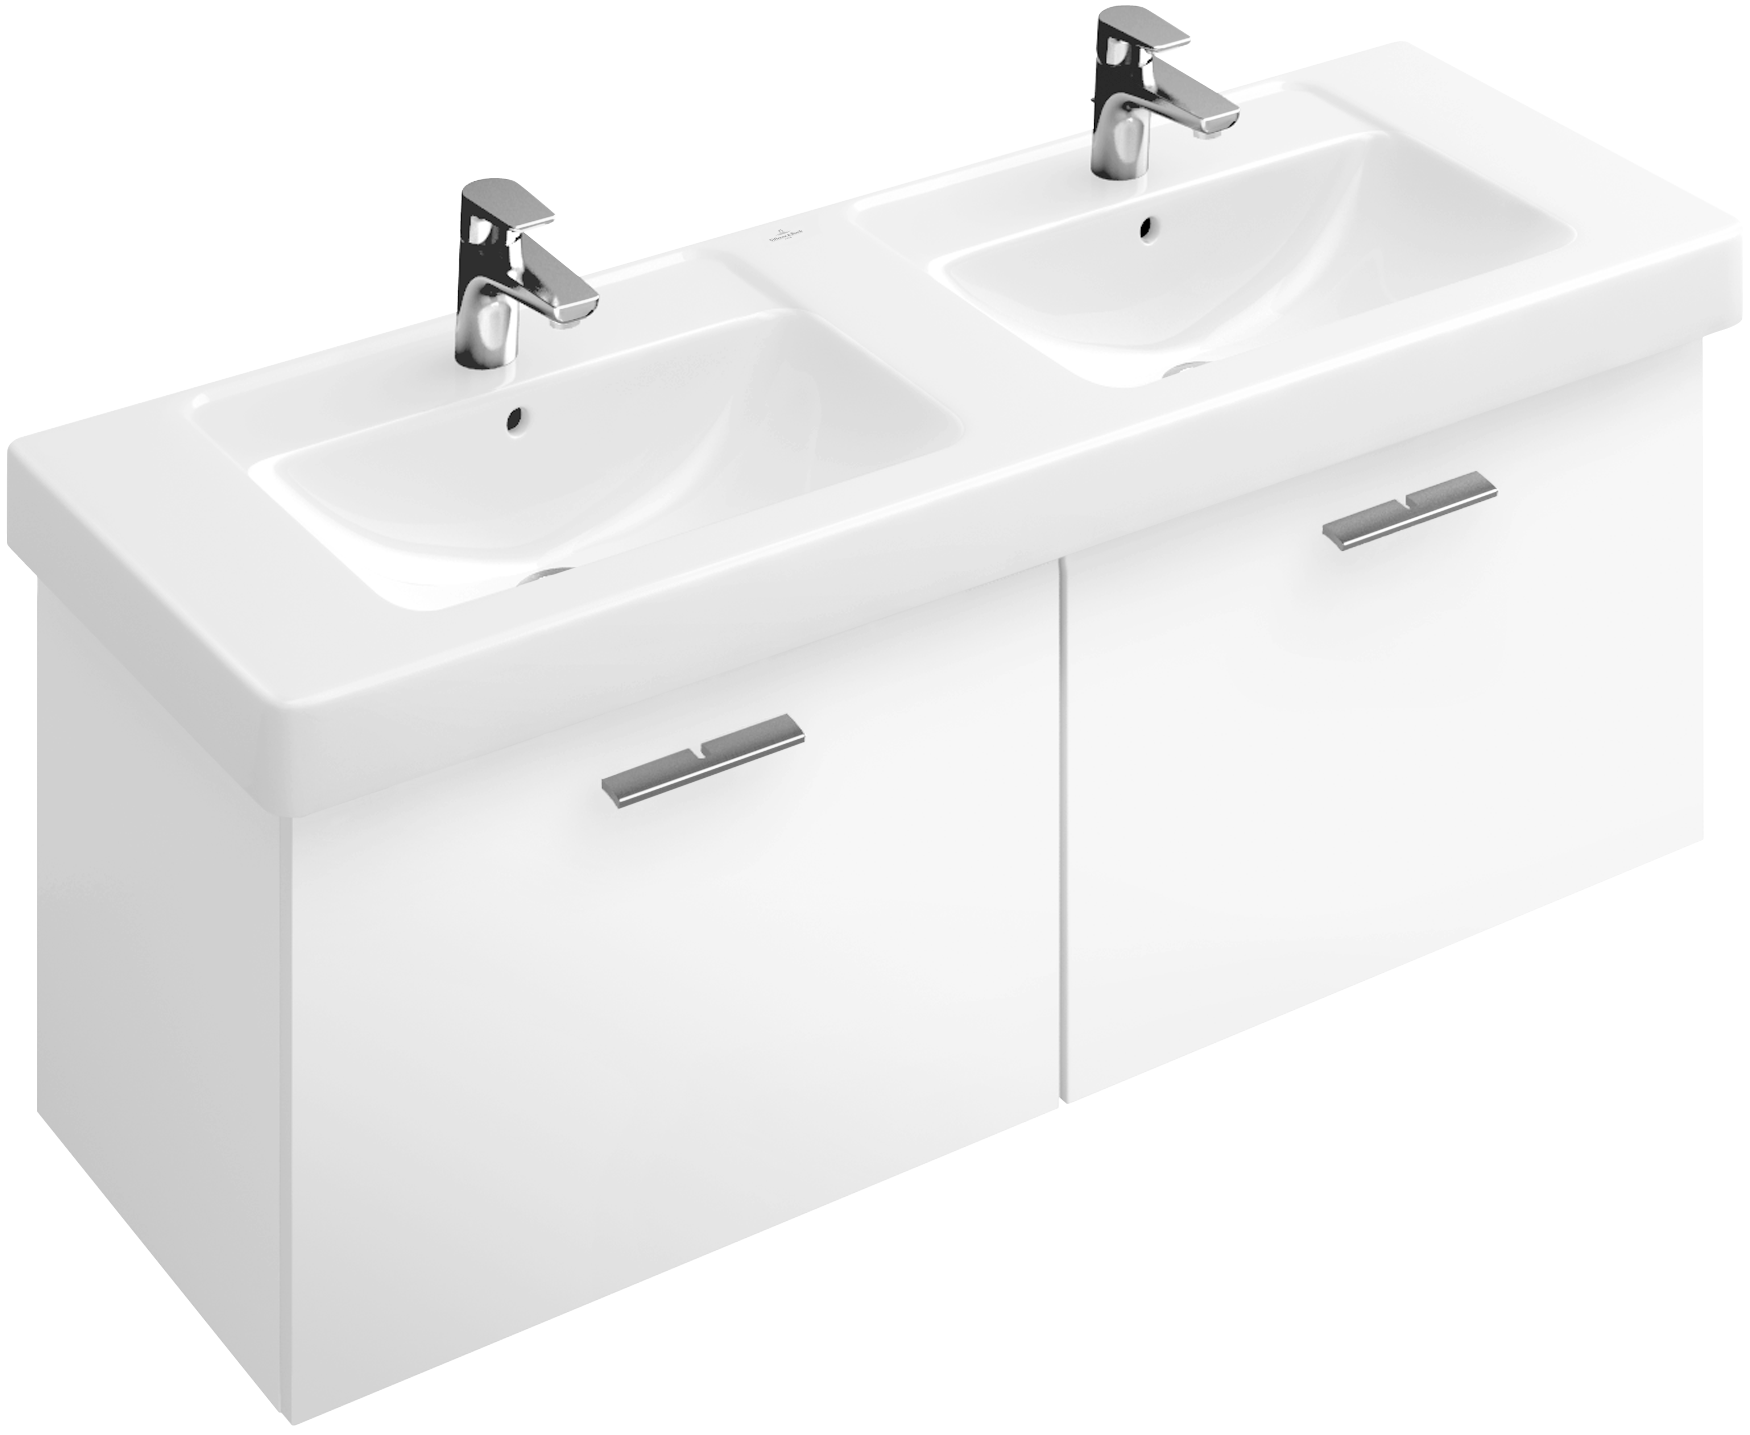 central line waschtischunterschrank a288p2 villeroy boch. Black Bedroom Furniture Sets. Home Design Ideas